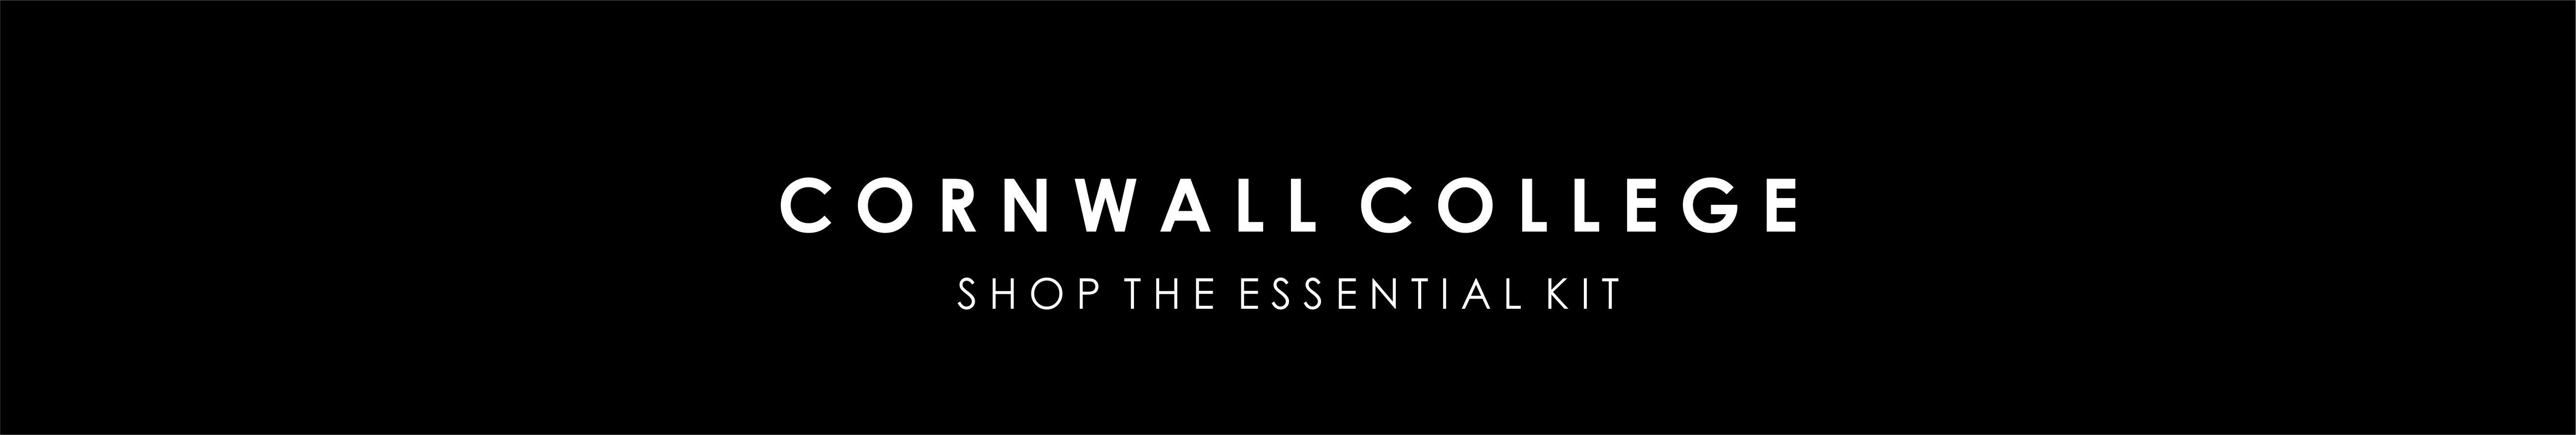 cornwall-college-banner-duchy-military.jpg